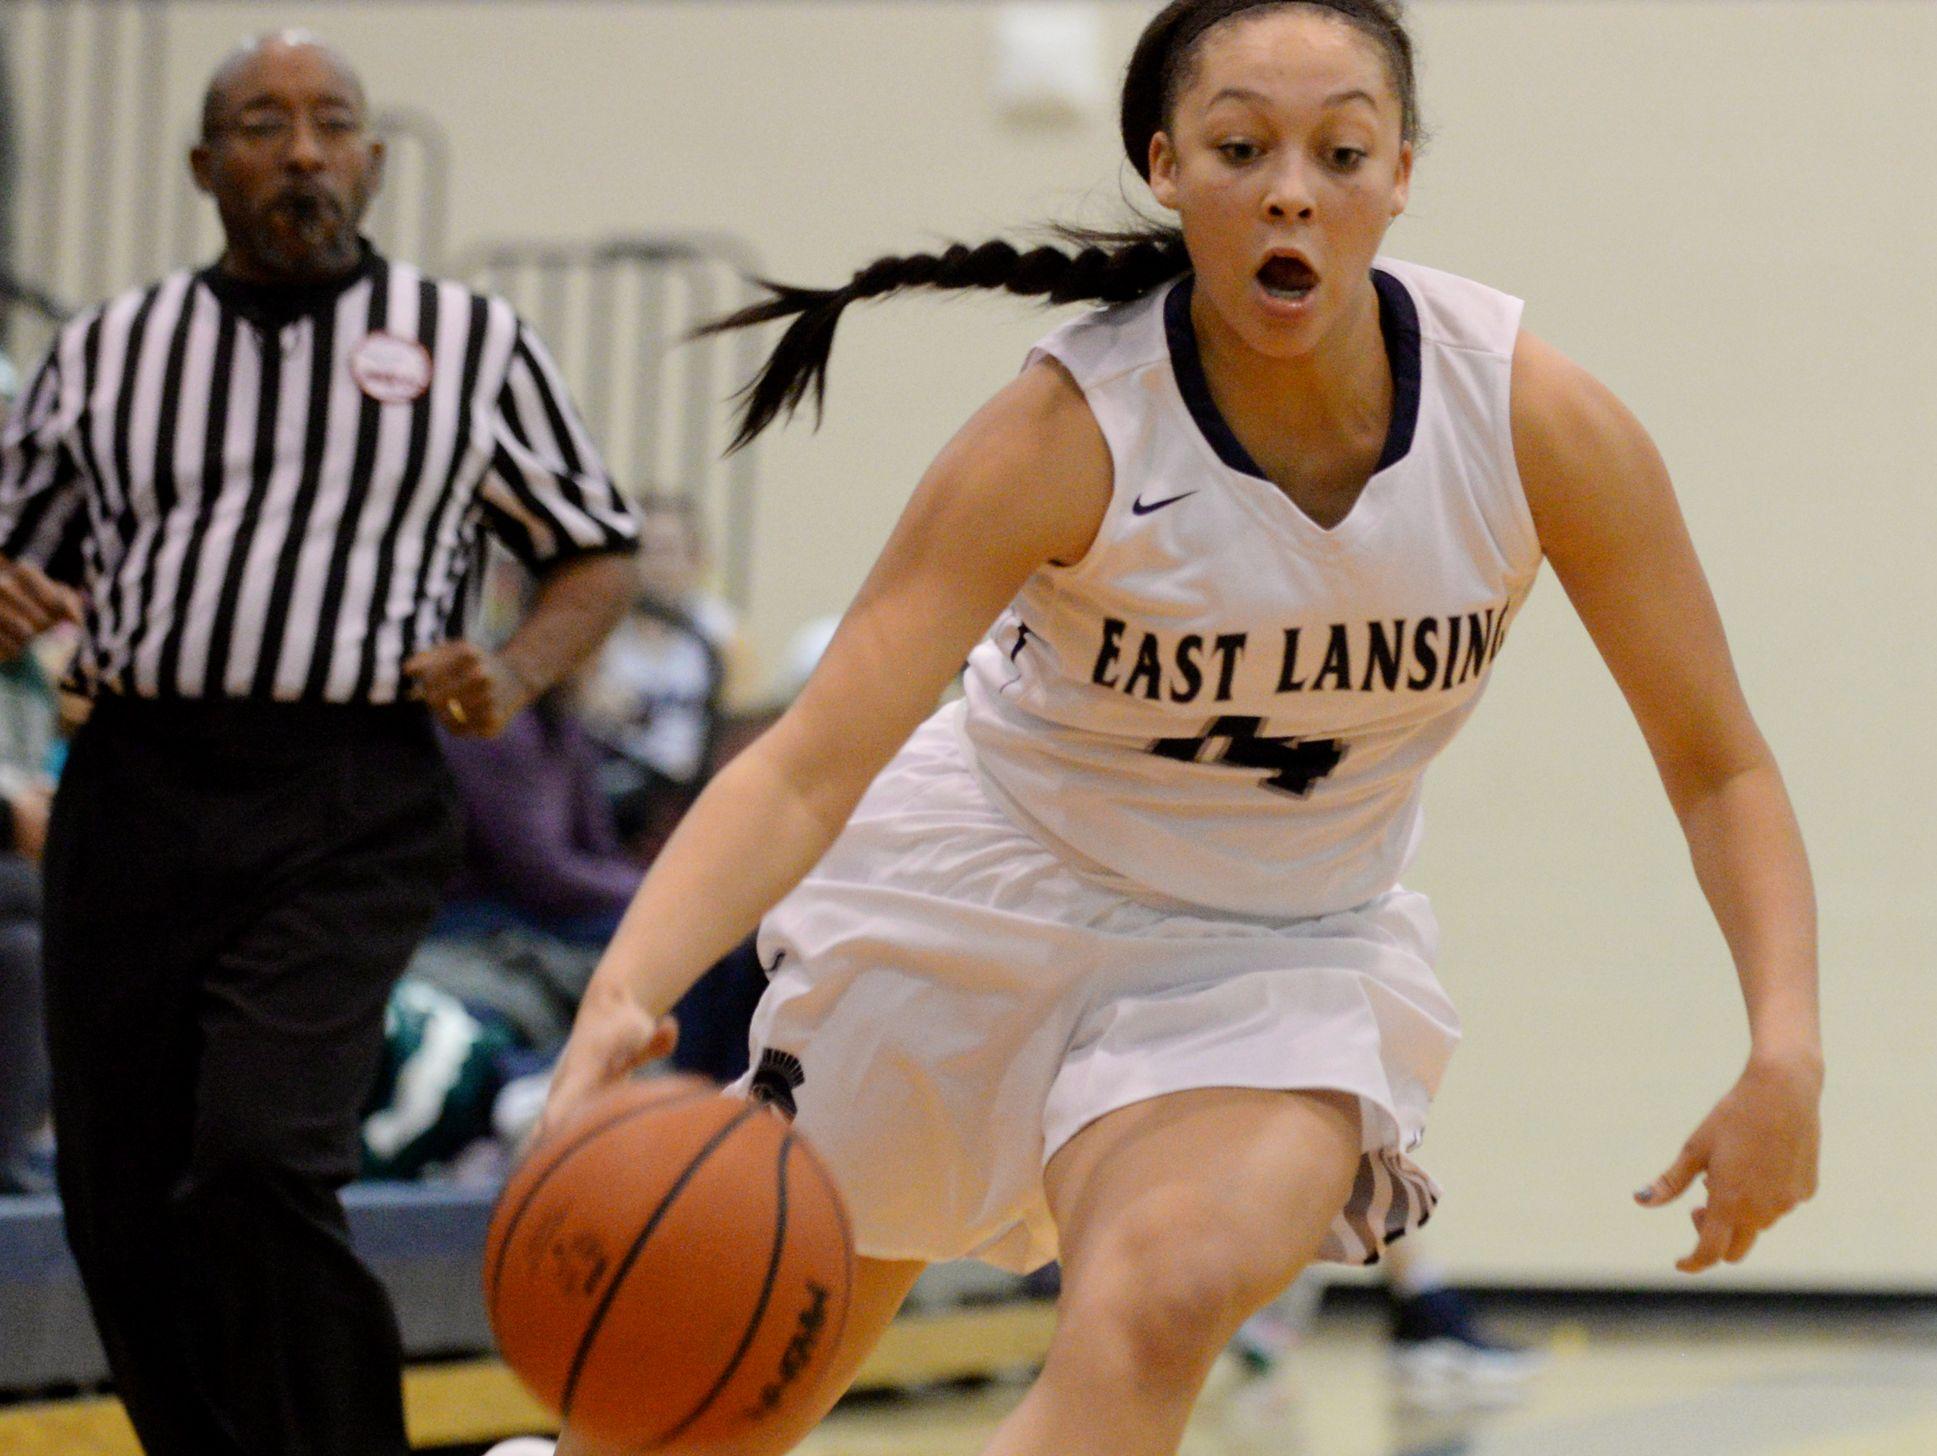 East Lansing's Aazhenii Nye runs the ball down the court during the game against Haslett on Tuesday, Dec. 13, 2016 at East Lansing High School. East Lansing won, 60-50.